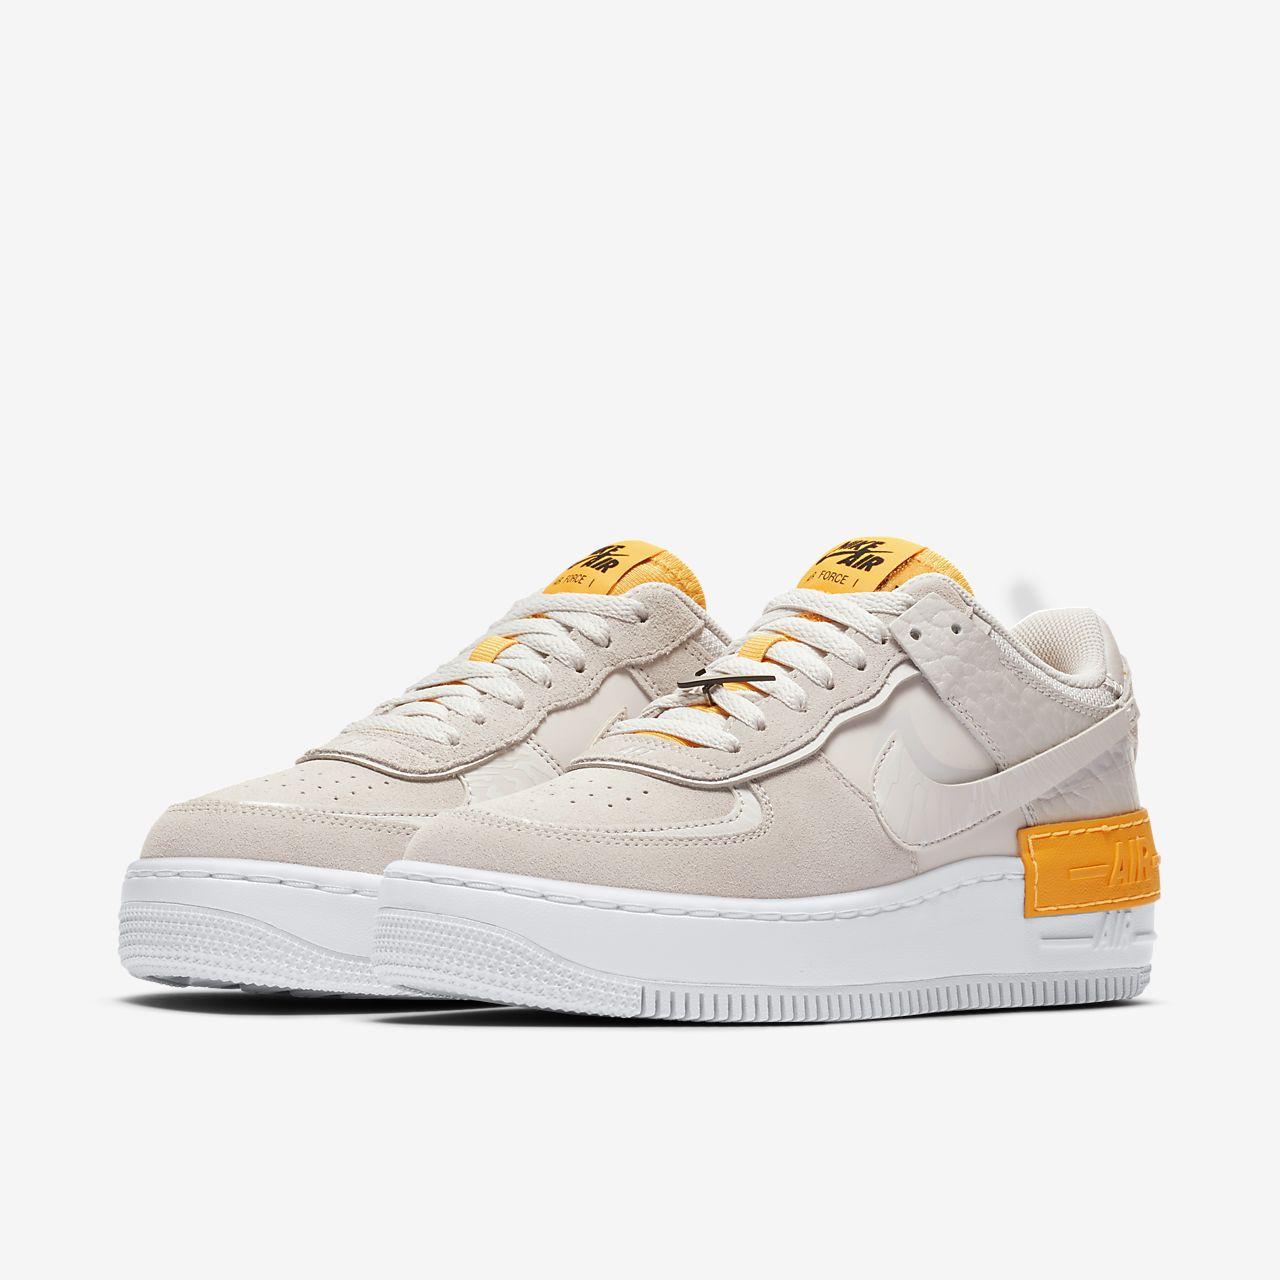 Nike Air Force 1 Shadow SE W shoes yellow orange white